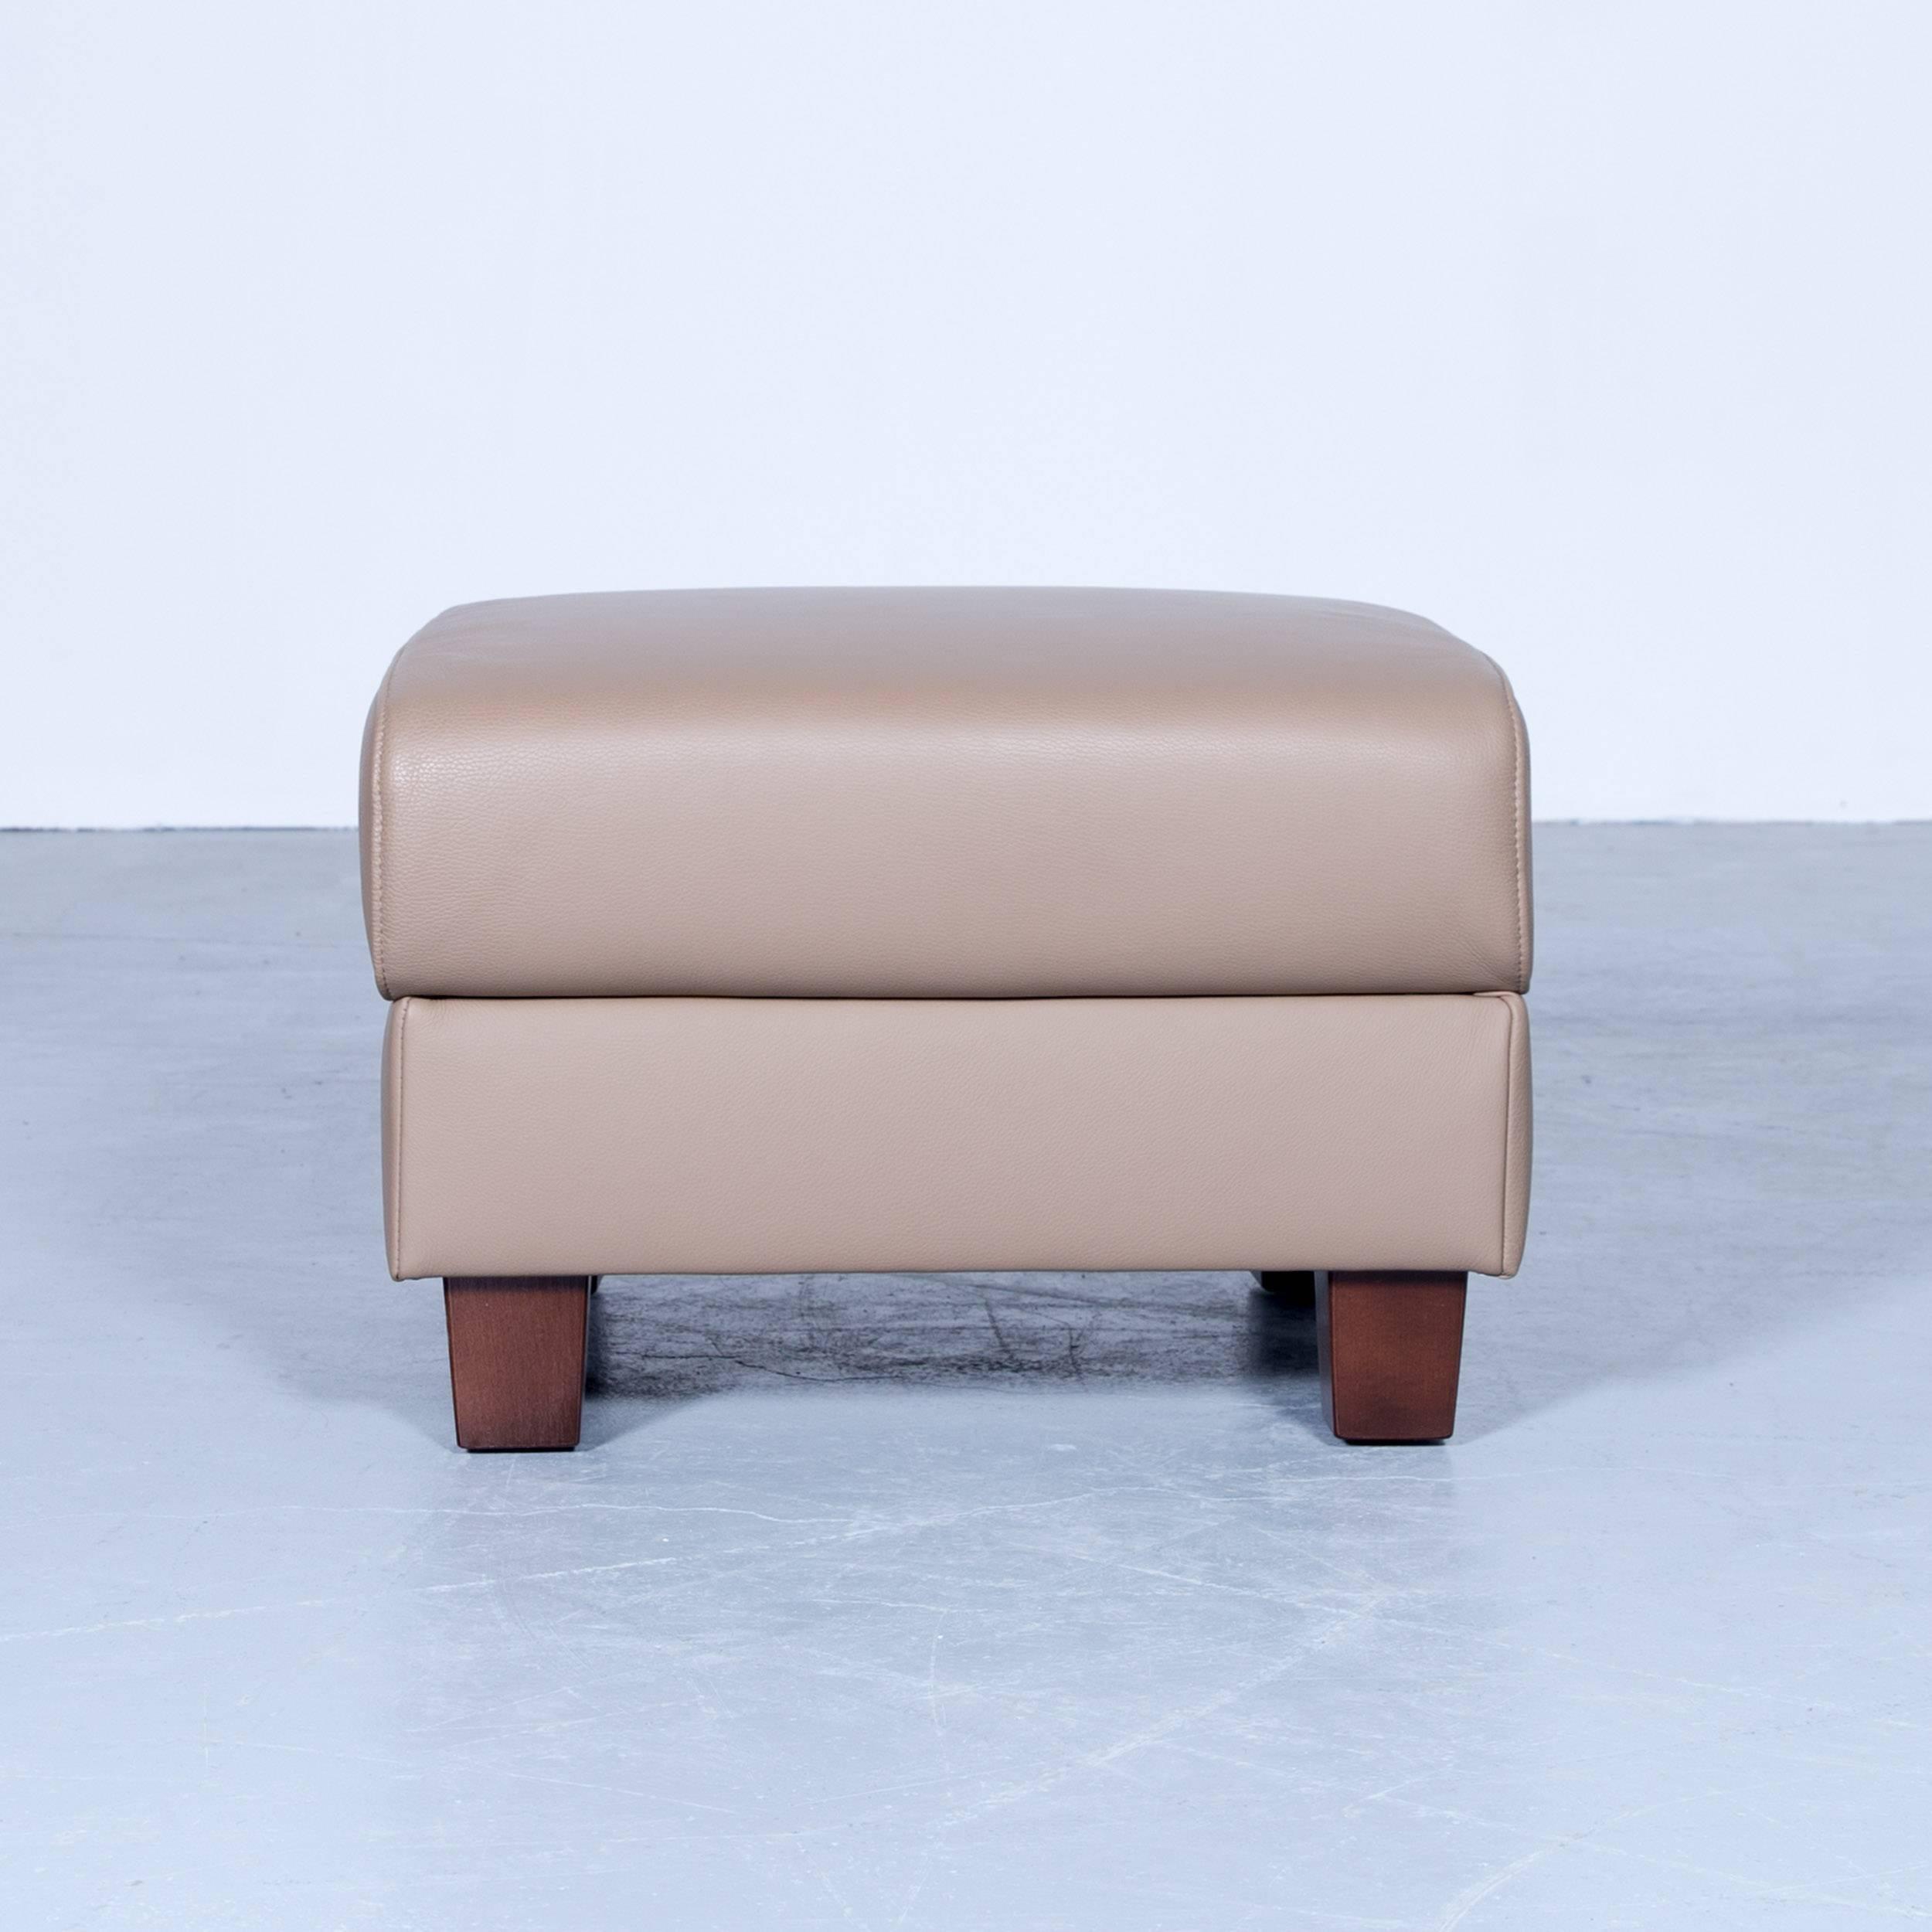 Akador Sofa Gallery Gepade Sofa Luxury Gepade Akador Designer